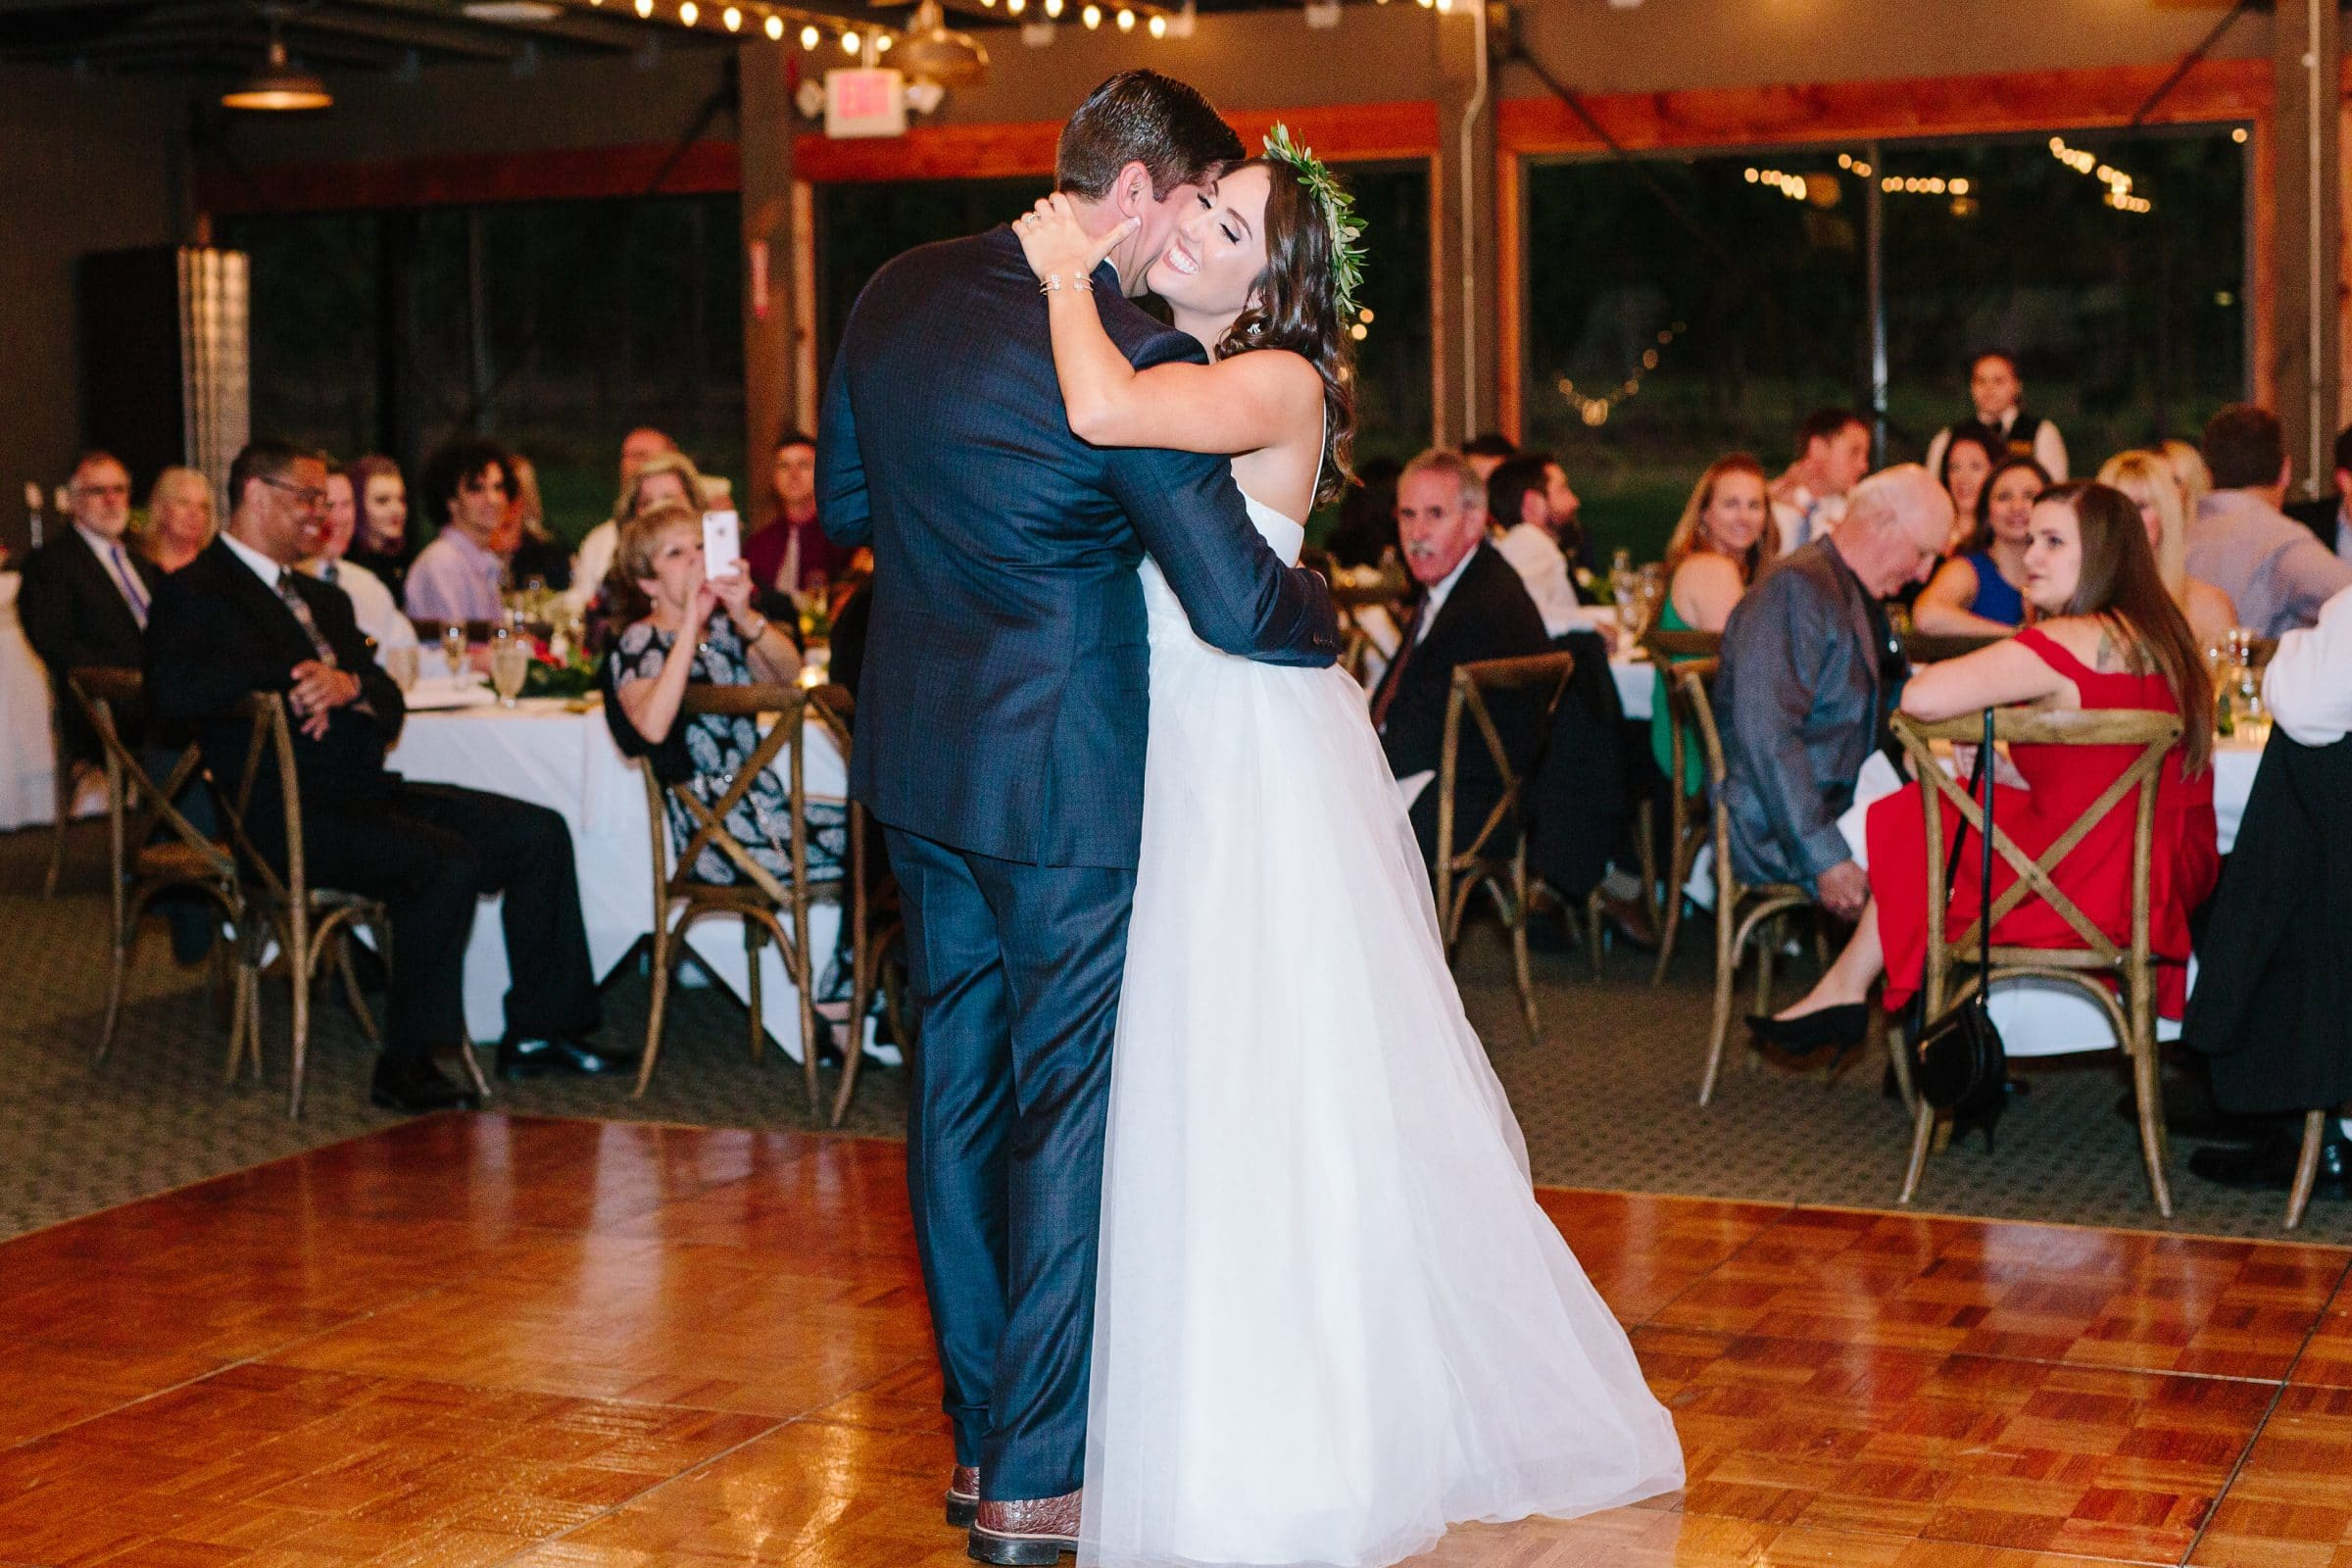 Boho chic bride with greenery headband shares first dance with groom